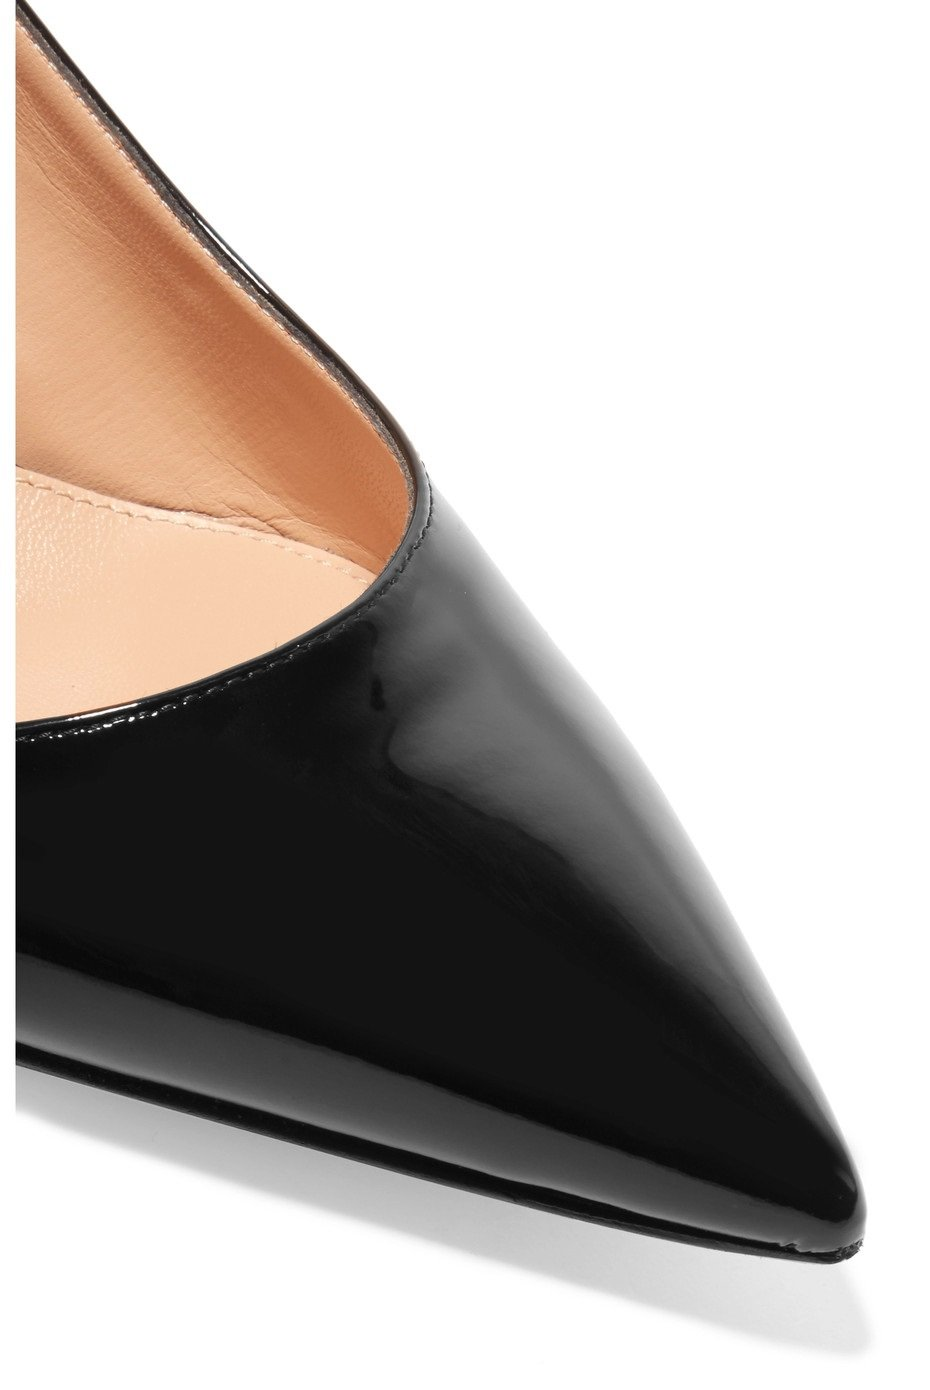 Sammitop Women's Pointed Toe Slingback Shoes Kitten Heel Pumps Comfortable Dress Shoes B07D4JPLDH 6.5 B(M) US|Black